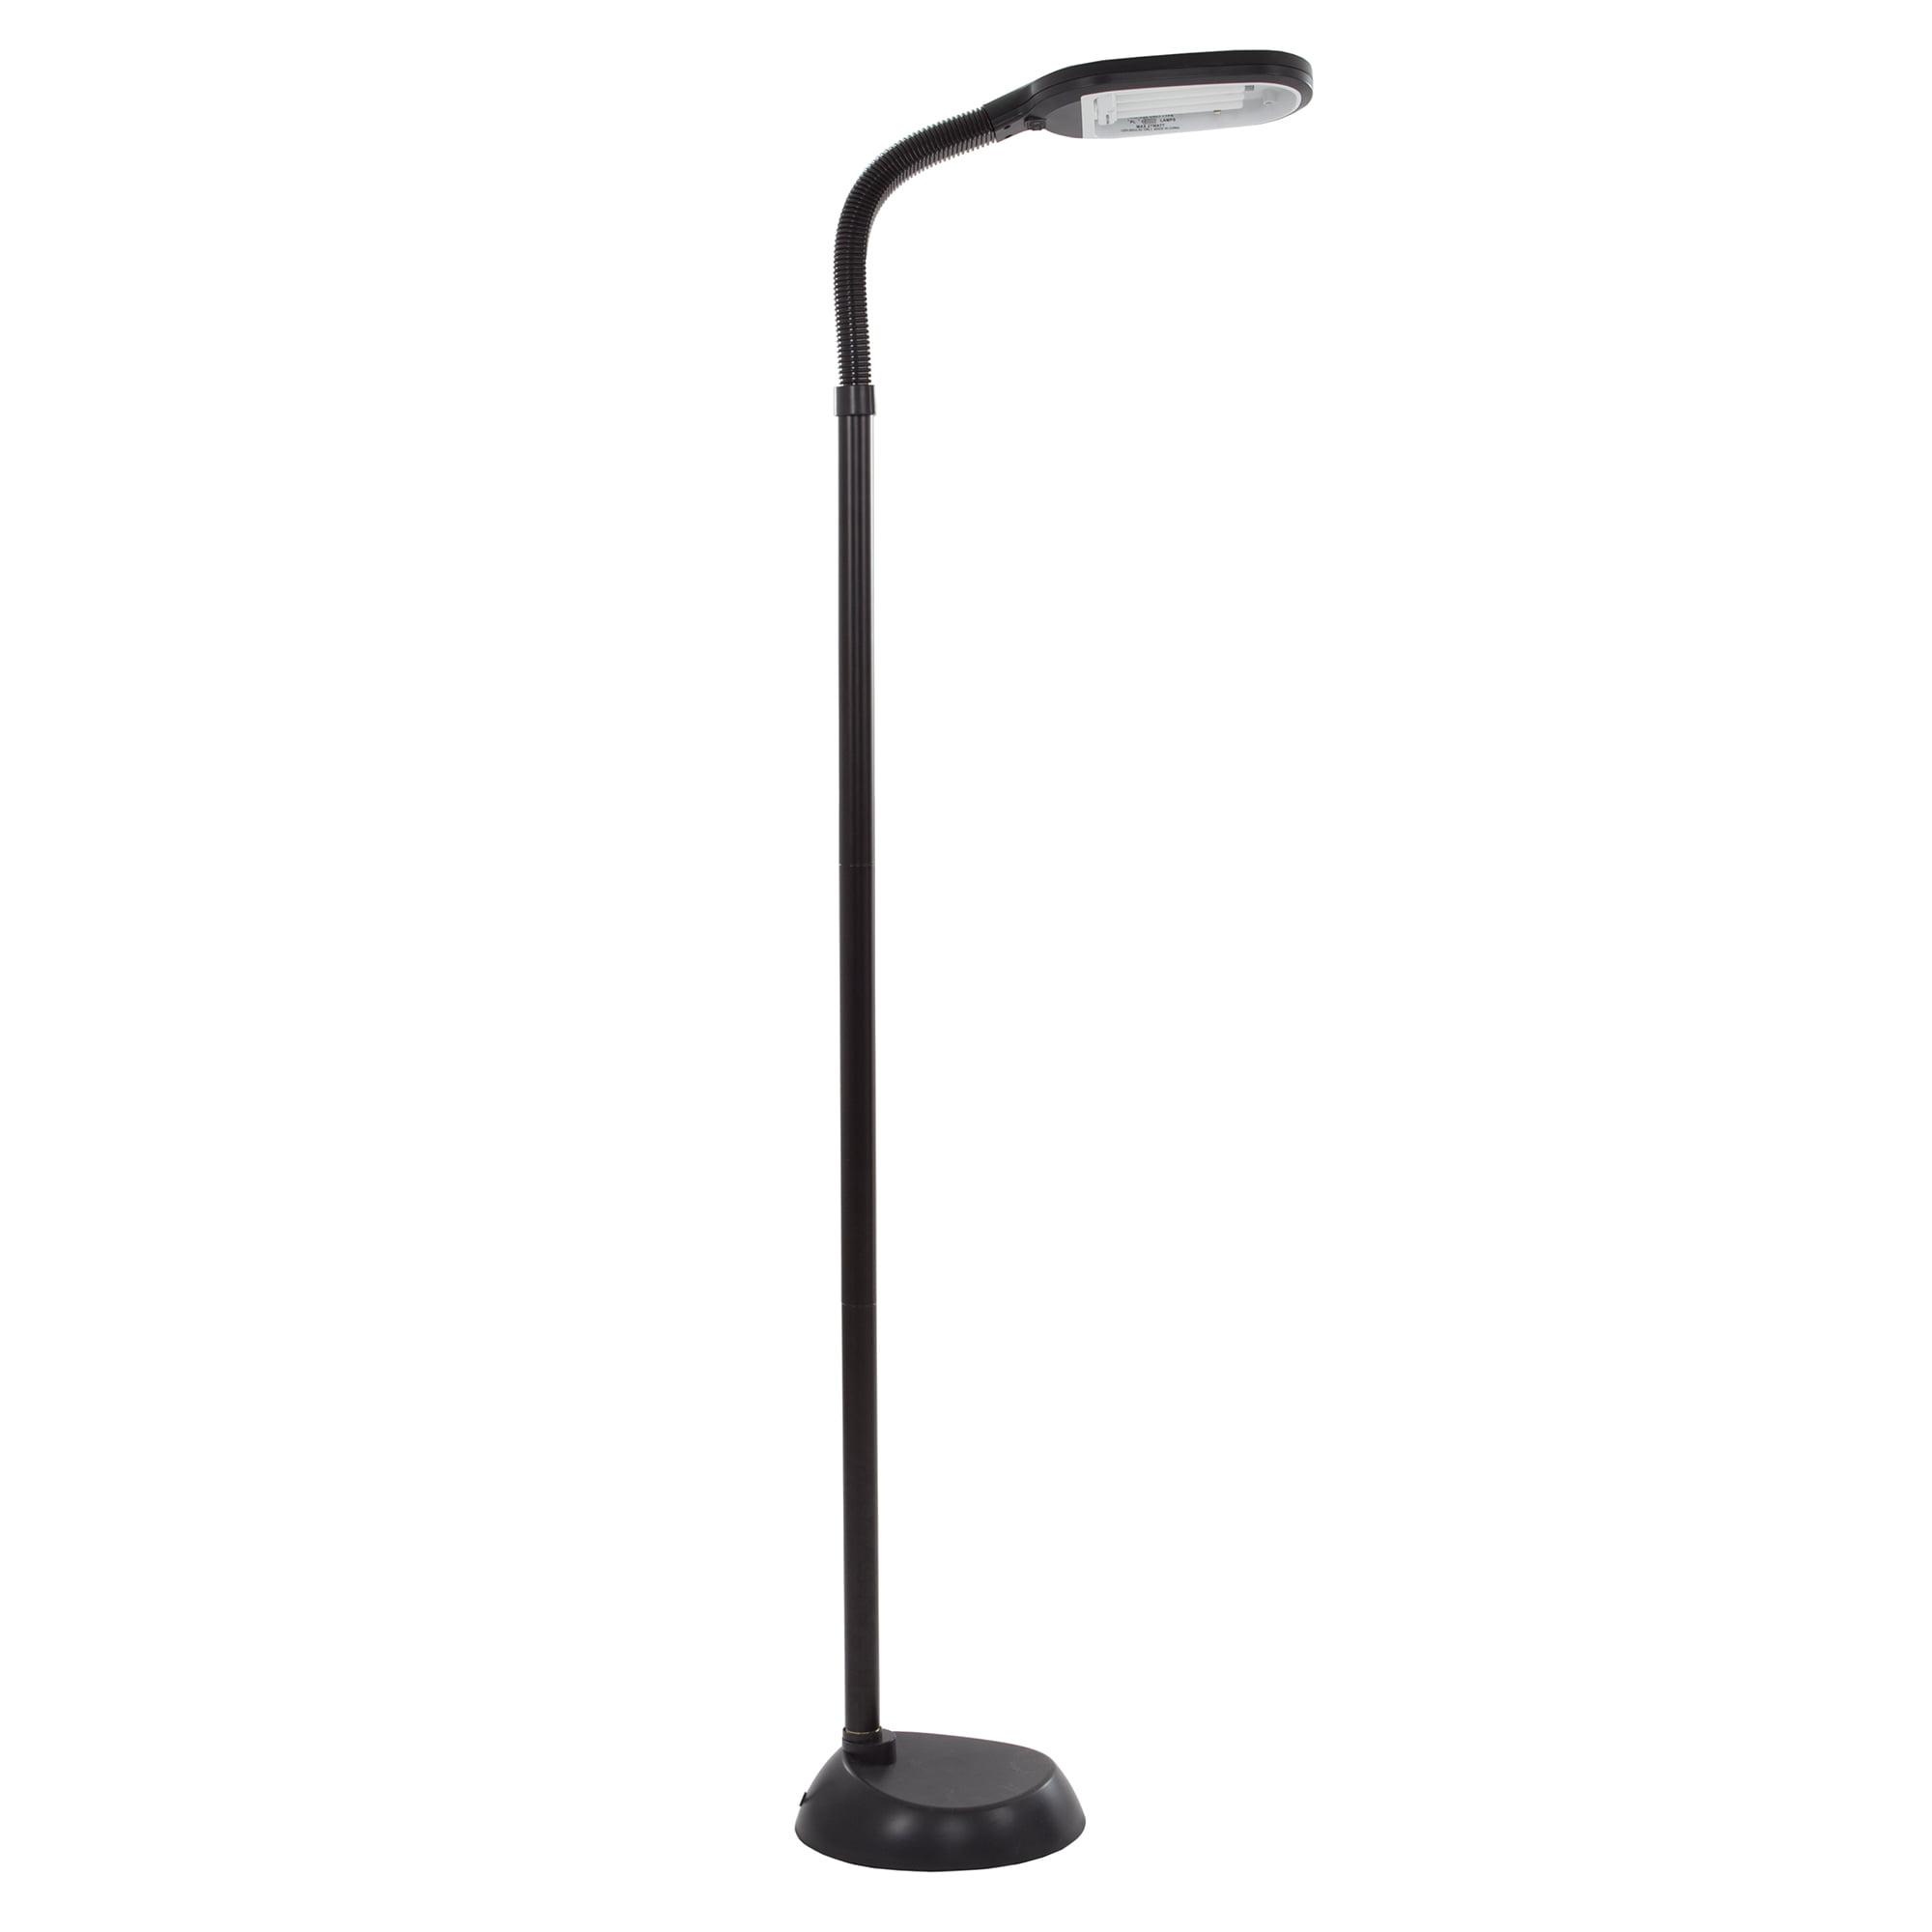 Lavish Home Sunlight Floor Lamp, 6', Black